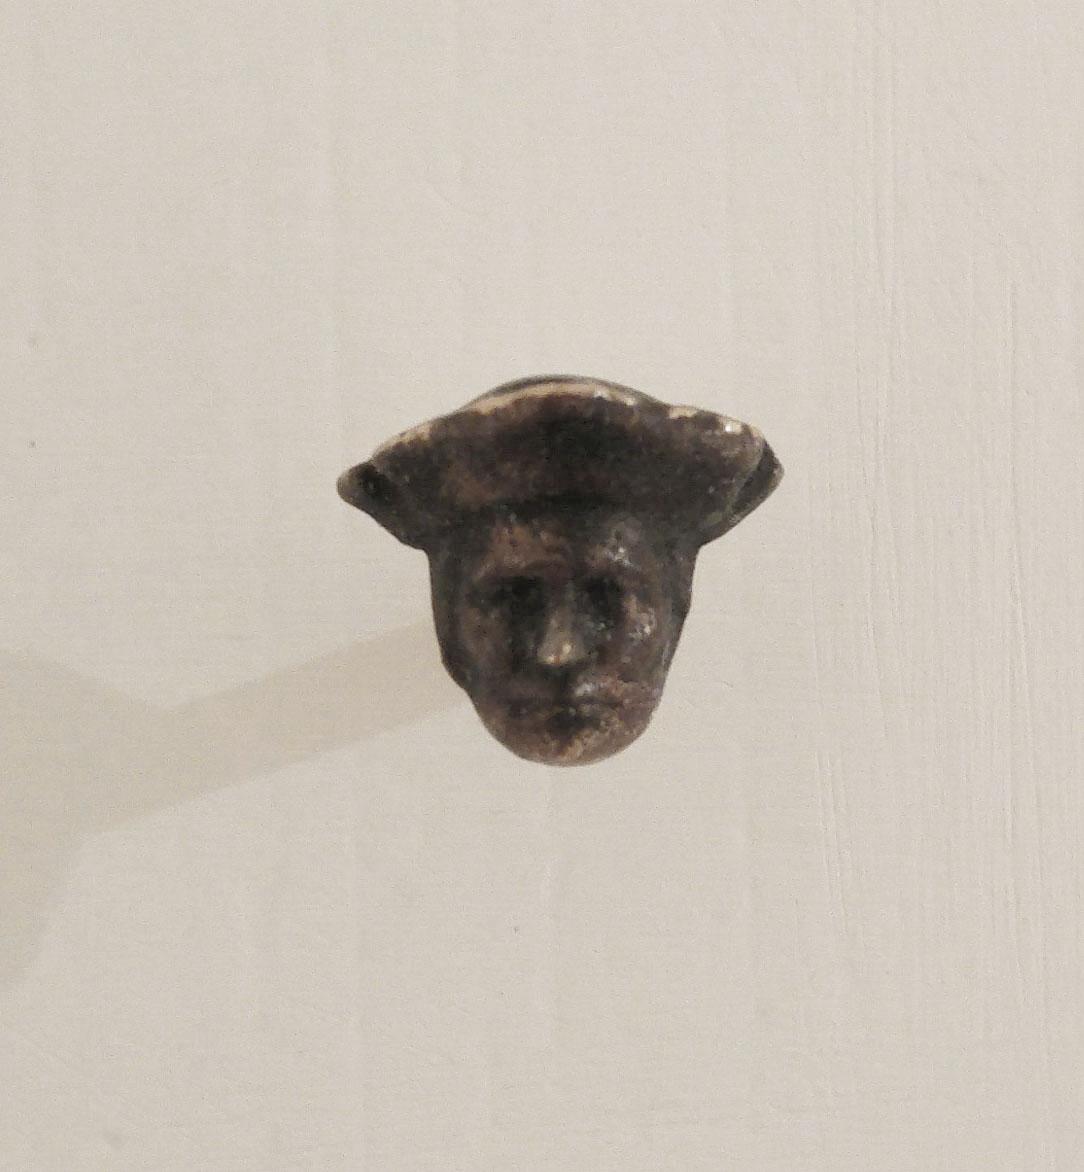 """More (I filosofi)"" 2016, bronzo, 8 x 22 x 5 mm"